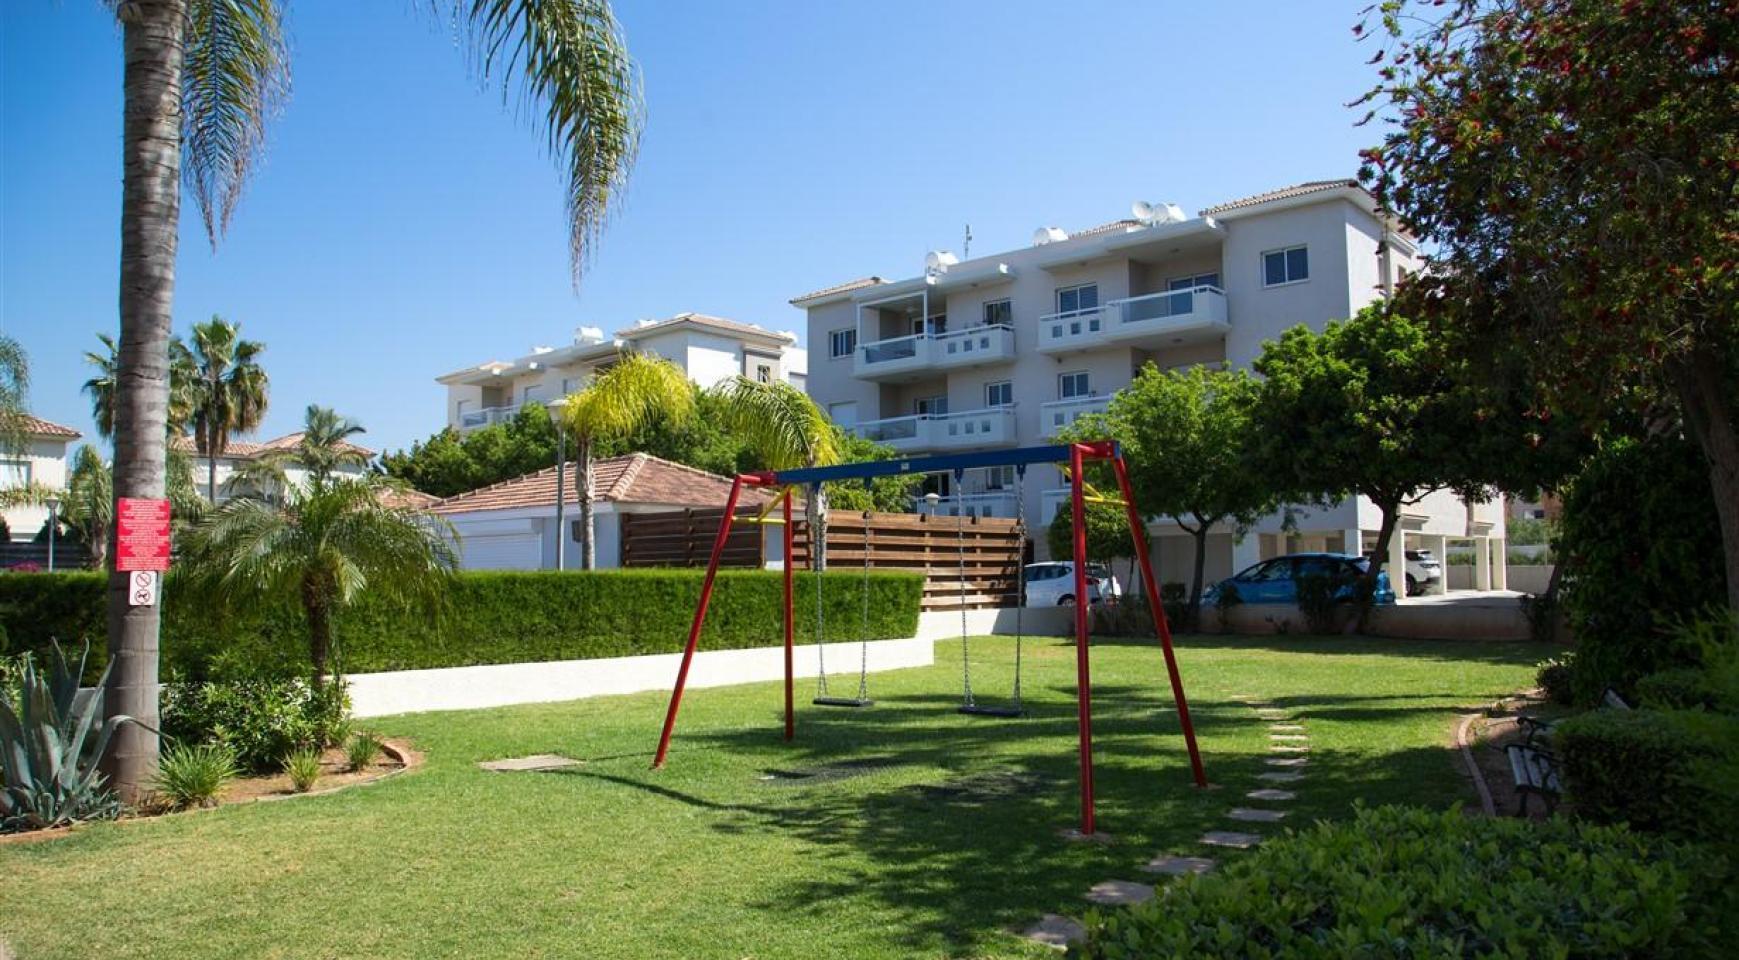 Luxury 2 Bedroom Apartment Mesogios Iris 304 in the Tourist area near the Beach - 34